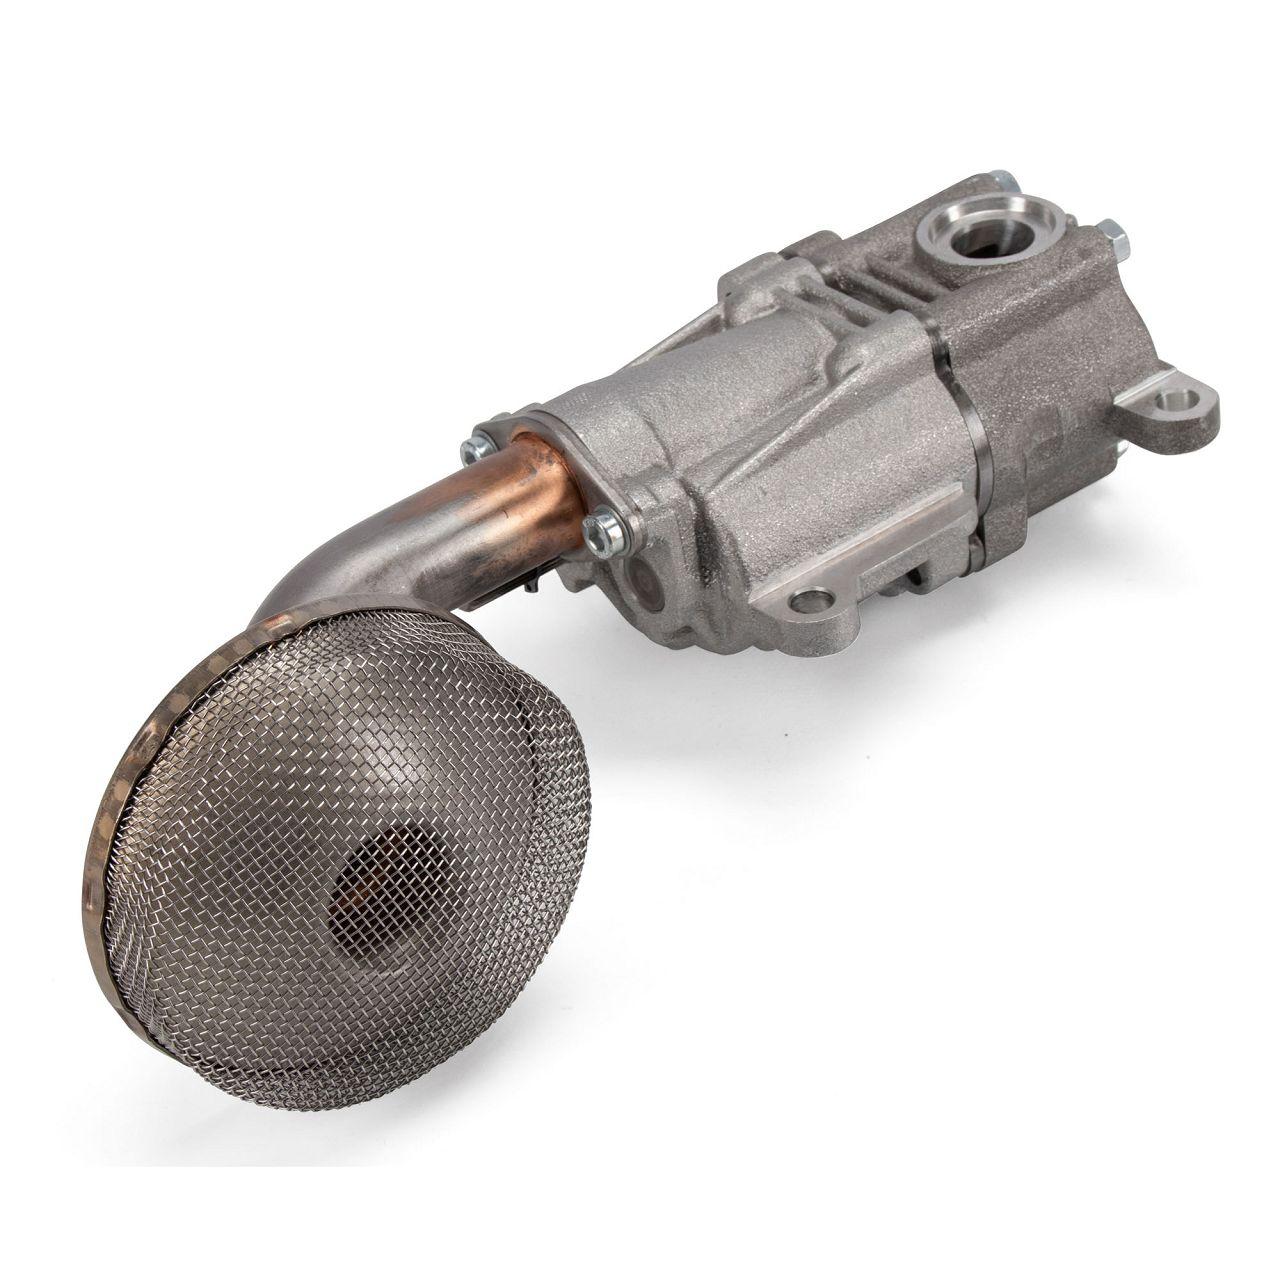 Ölpumpe Motorölpumpe für PORSCHE 911 3.2 / 3.2 SC Carrera 1983-1989 91110700805